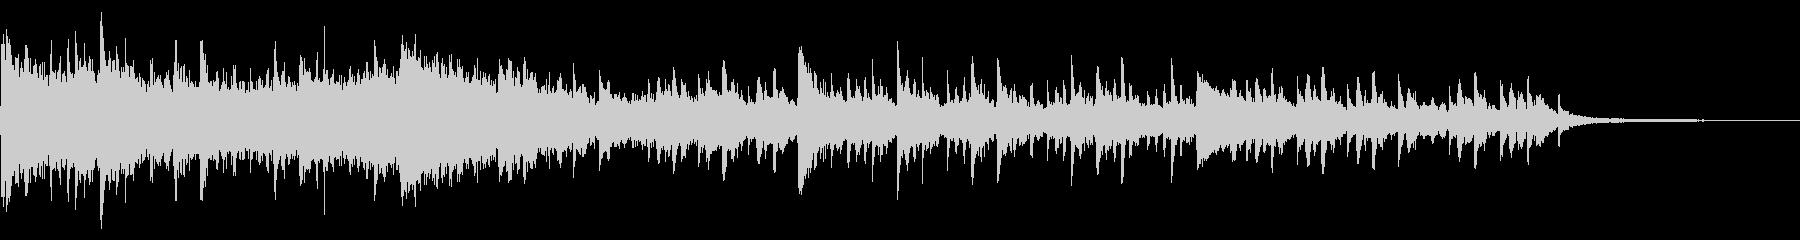 Horror / Creepy Piano BGM's unreproduced waveform